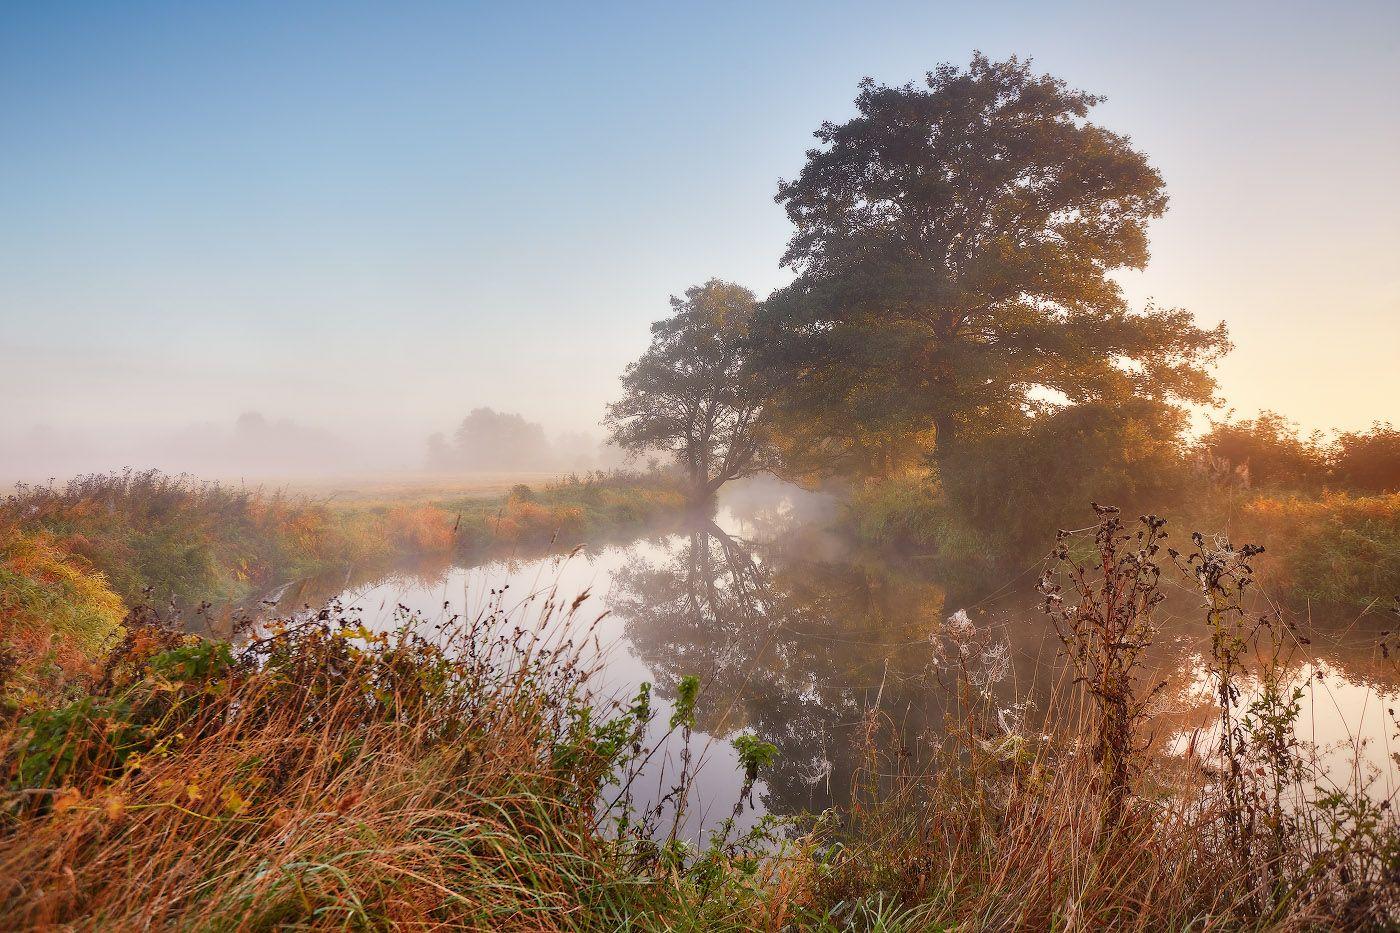 Утро сентября Беларусь Осень Рассвет Река Сентябрь Туман Уса Утро